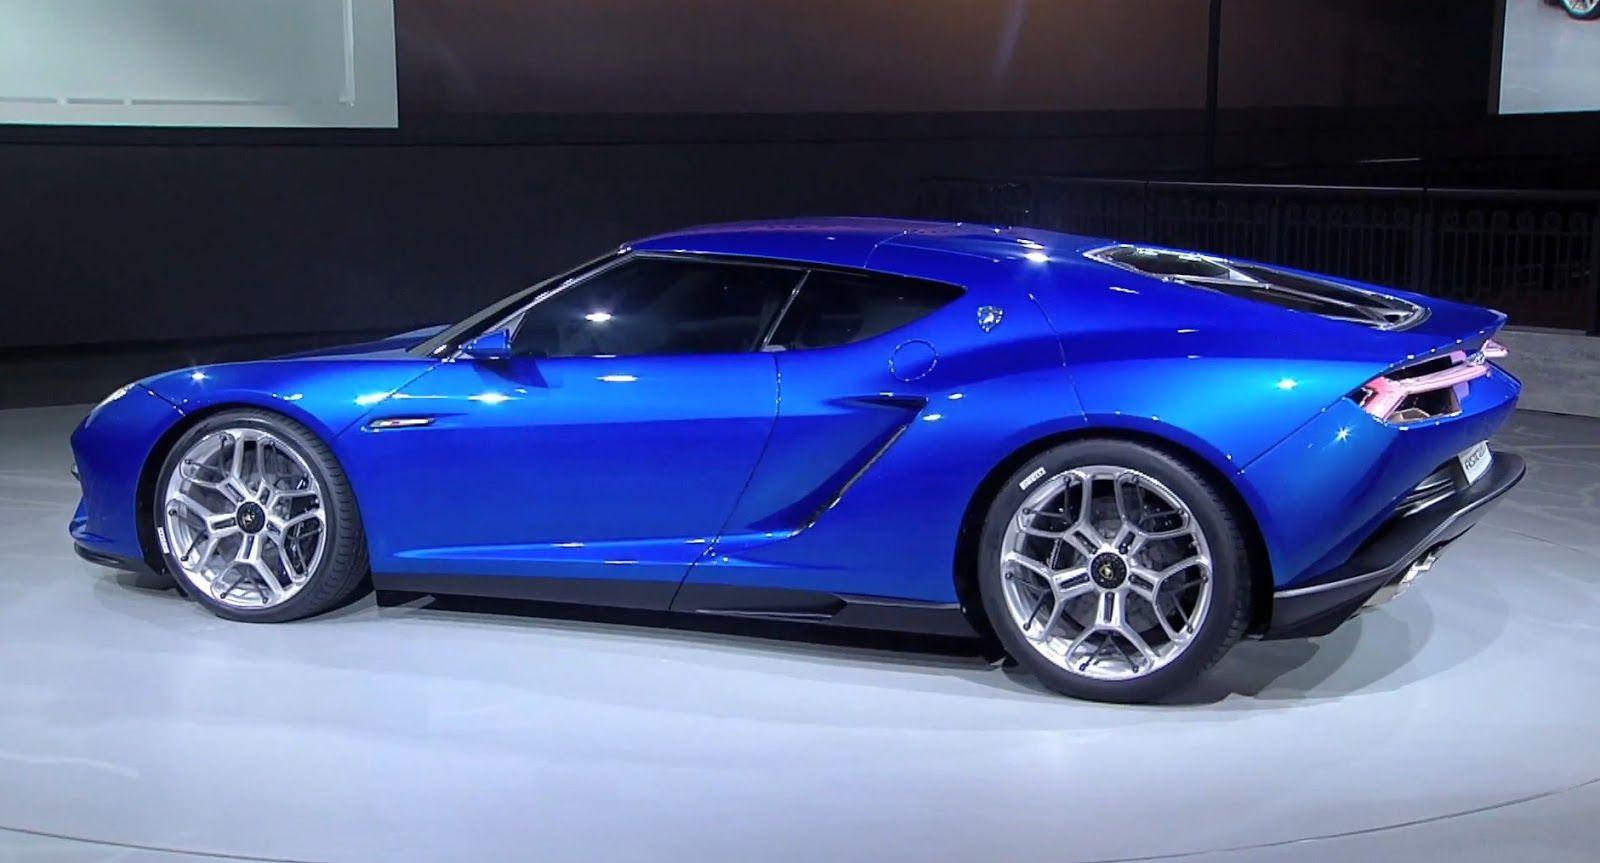 Lamborghini Asterion Lpi 910 4 Live Photos And Videos Tuff Cars